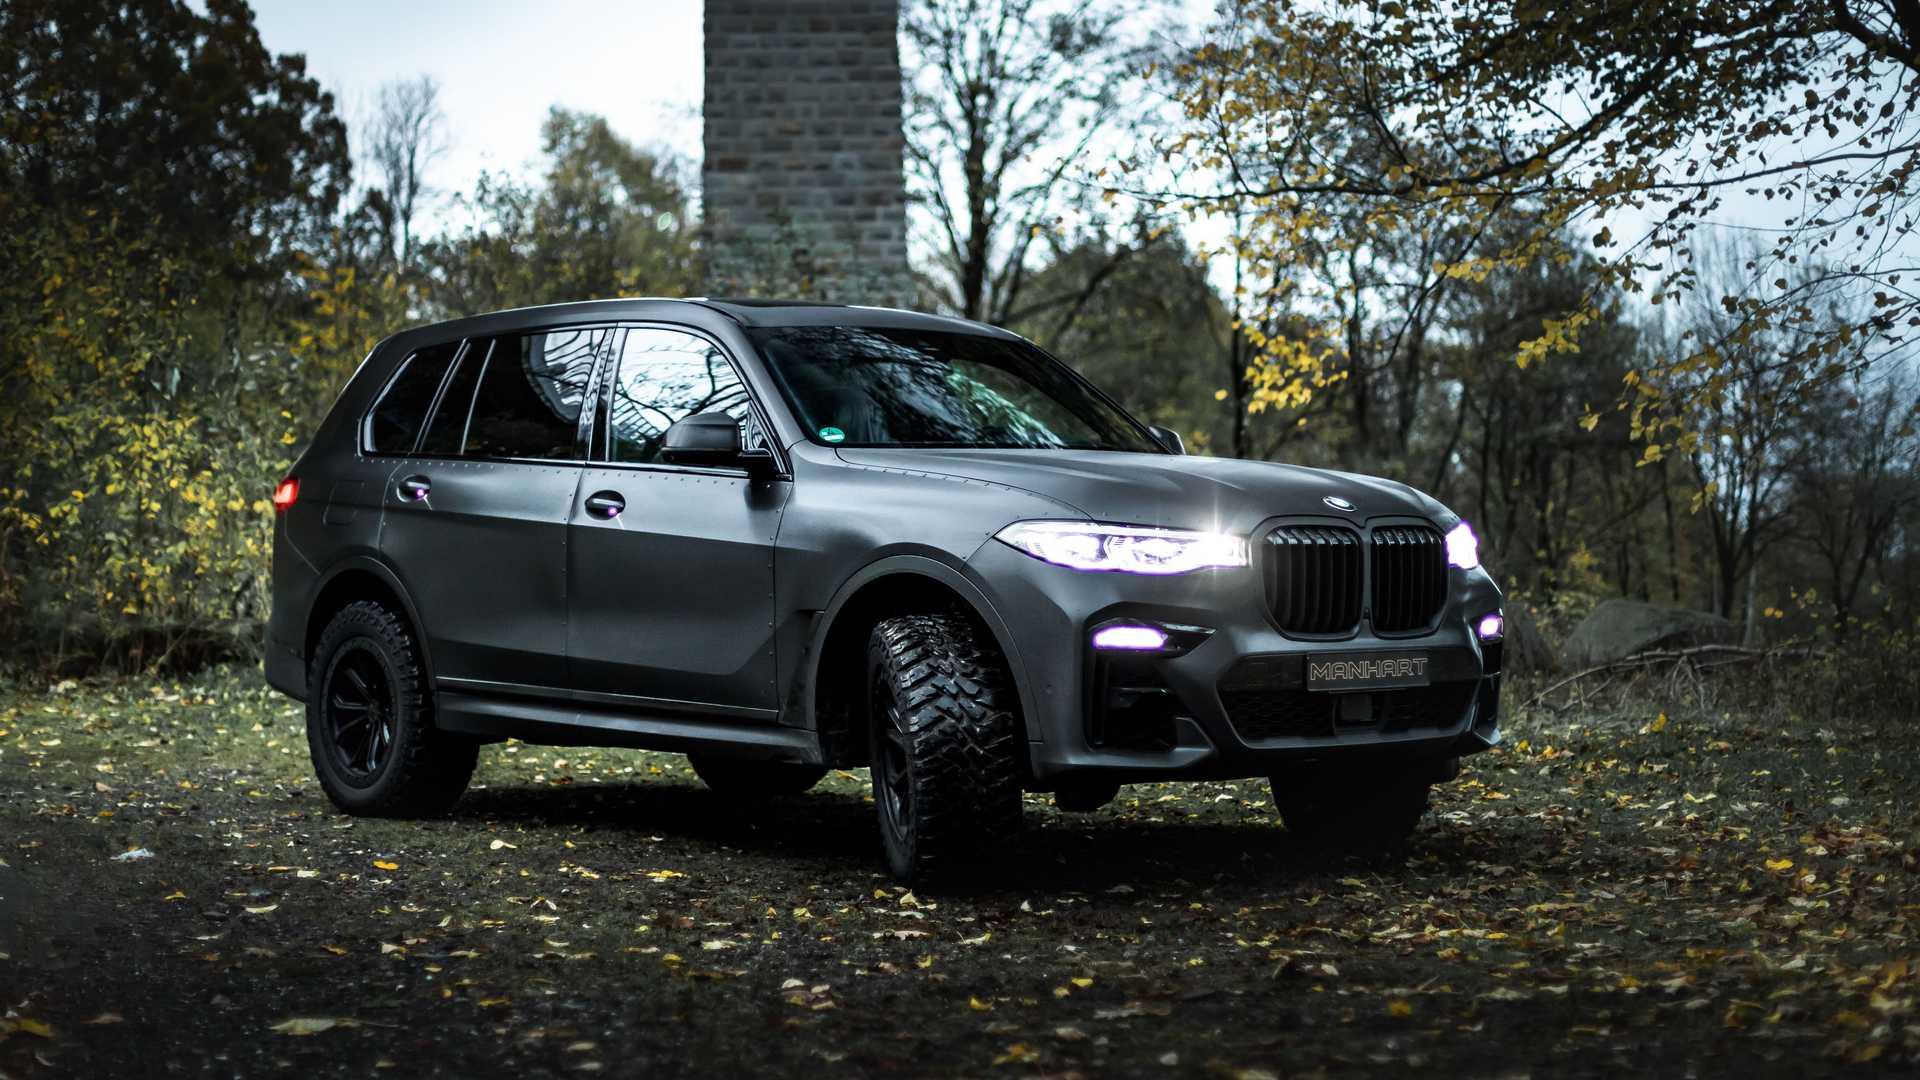 BMW-X7-Dirt-Edition-By-Manhart-1